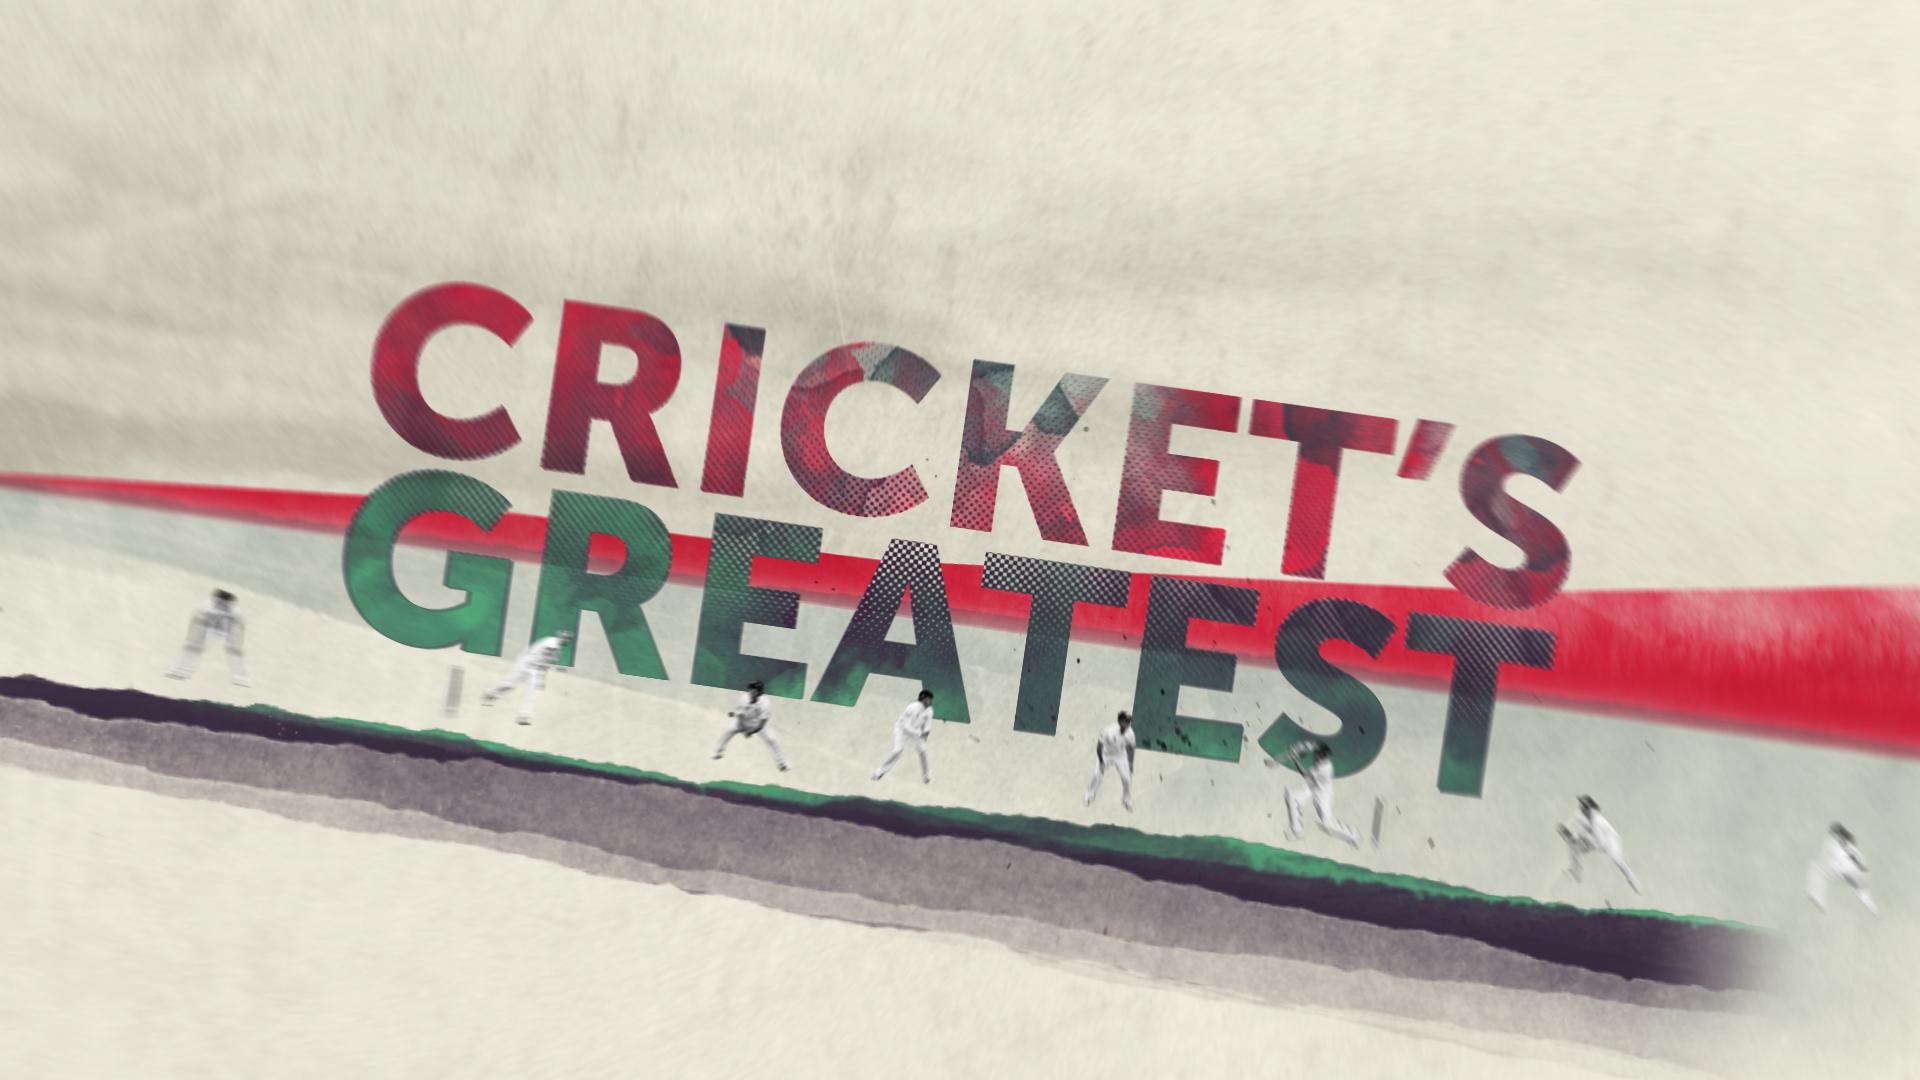 Crickets_Greatest_02.jpg